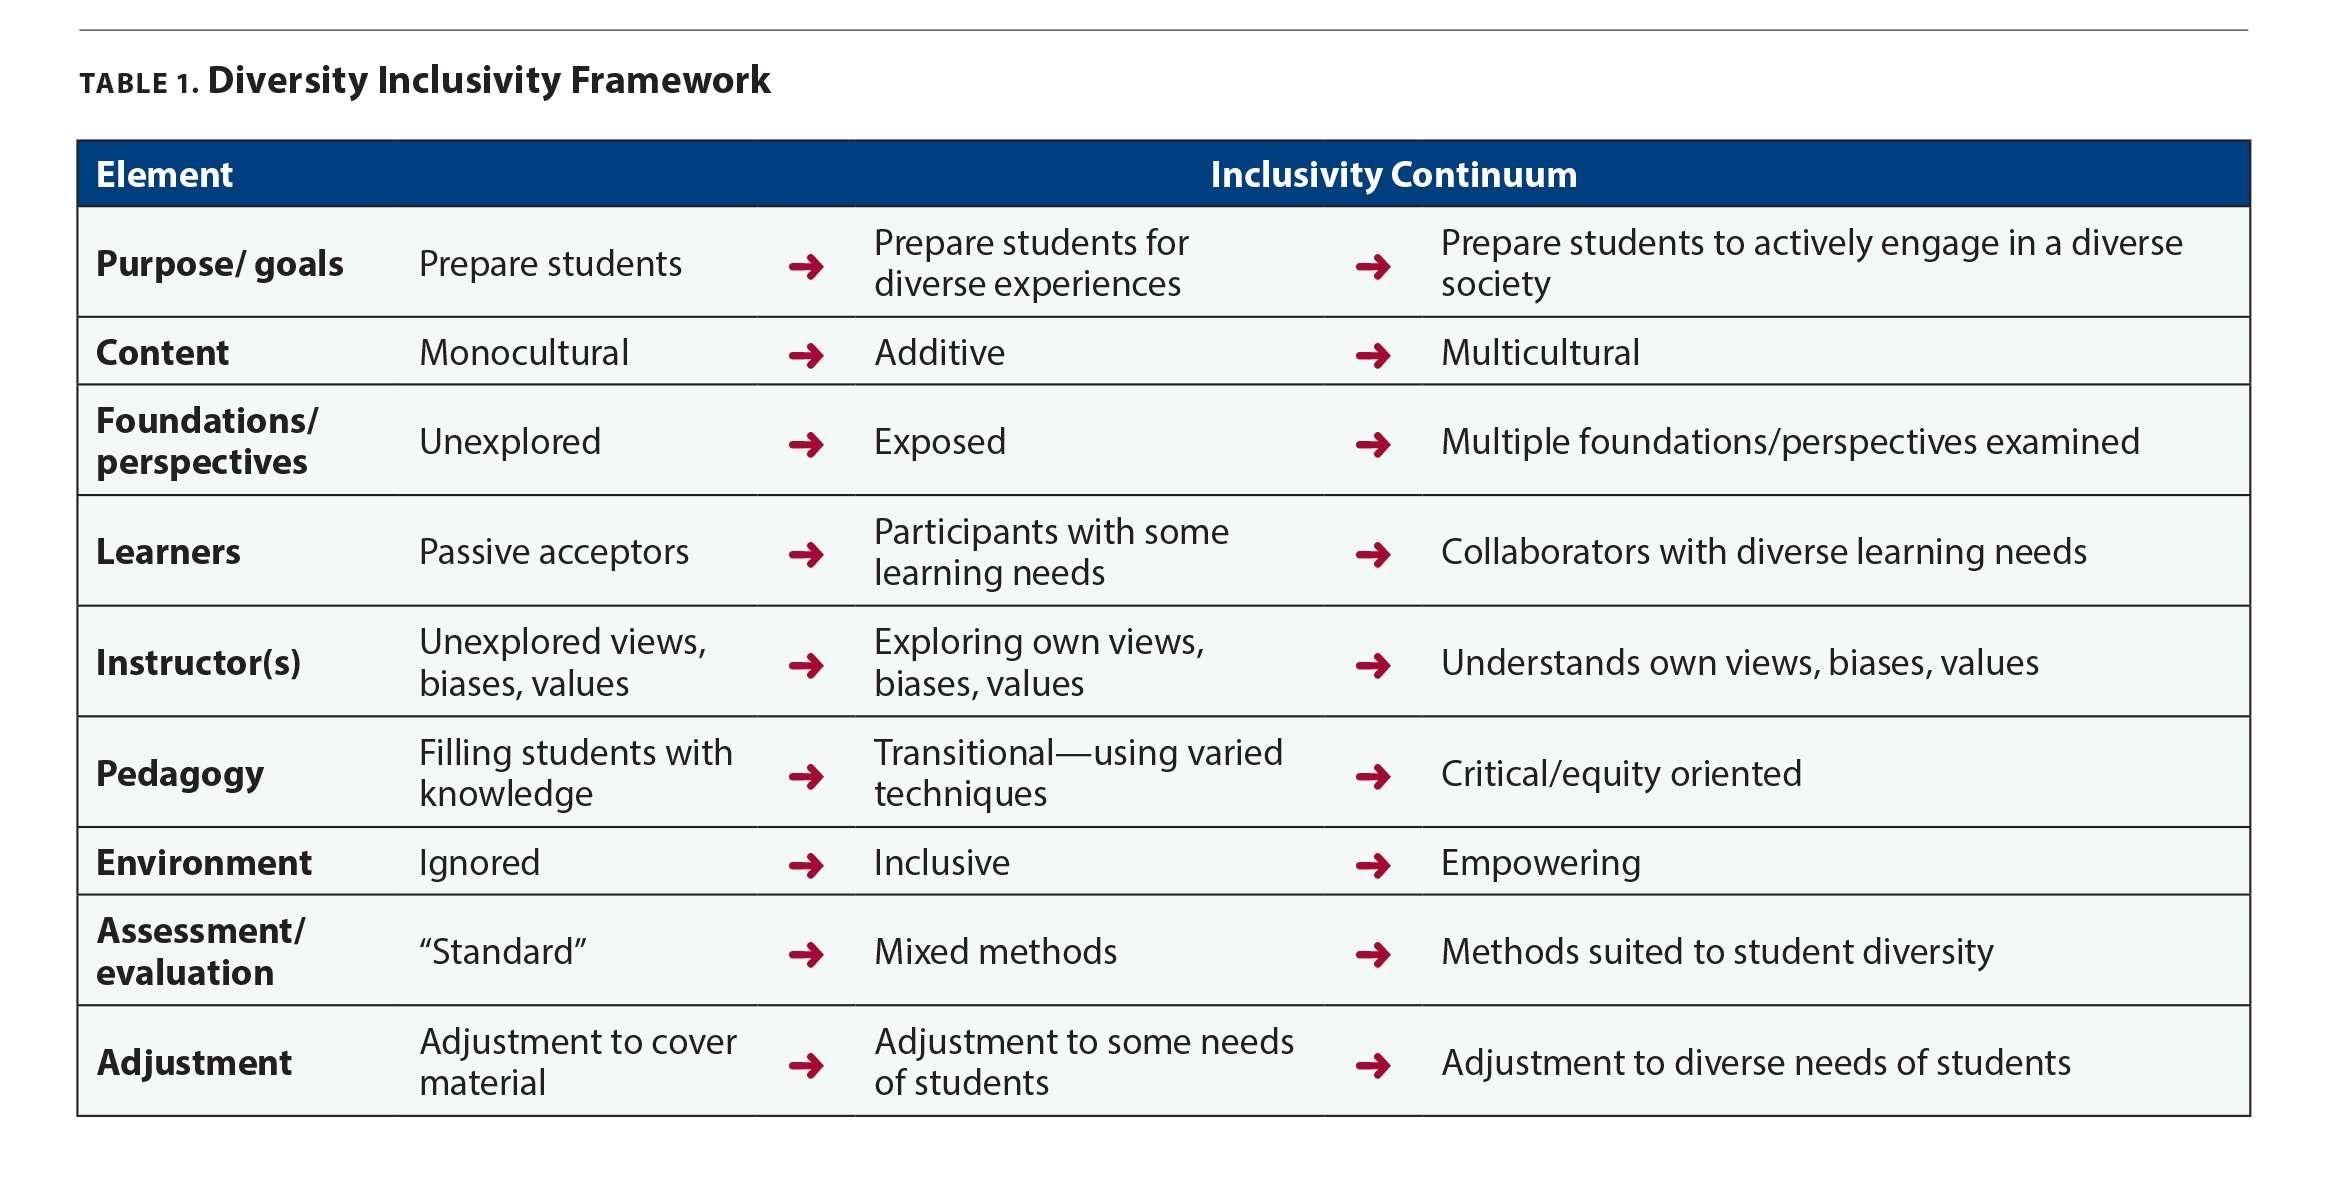 Diversity Insensitivity Framework